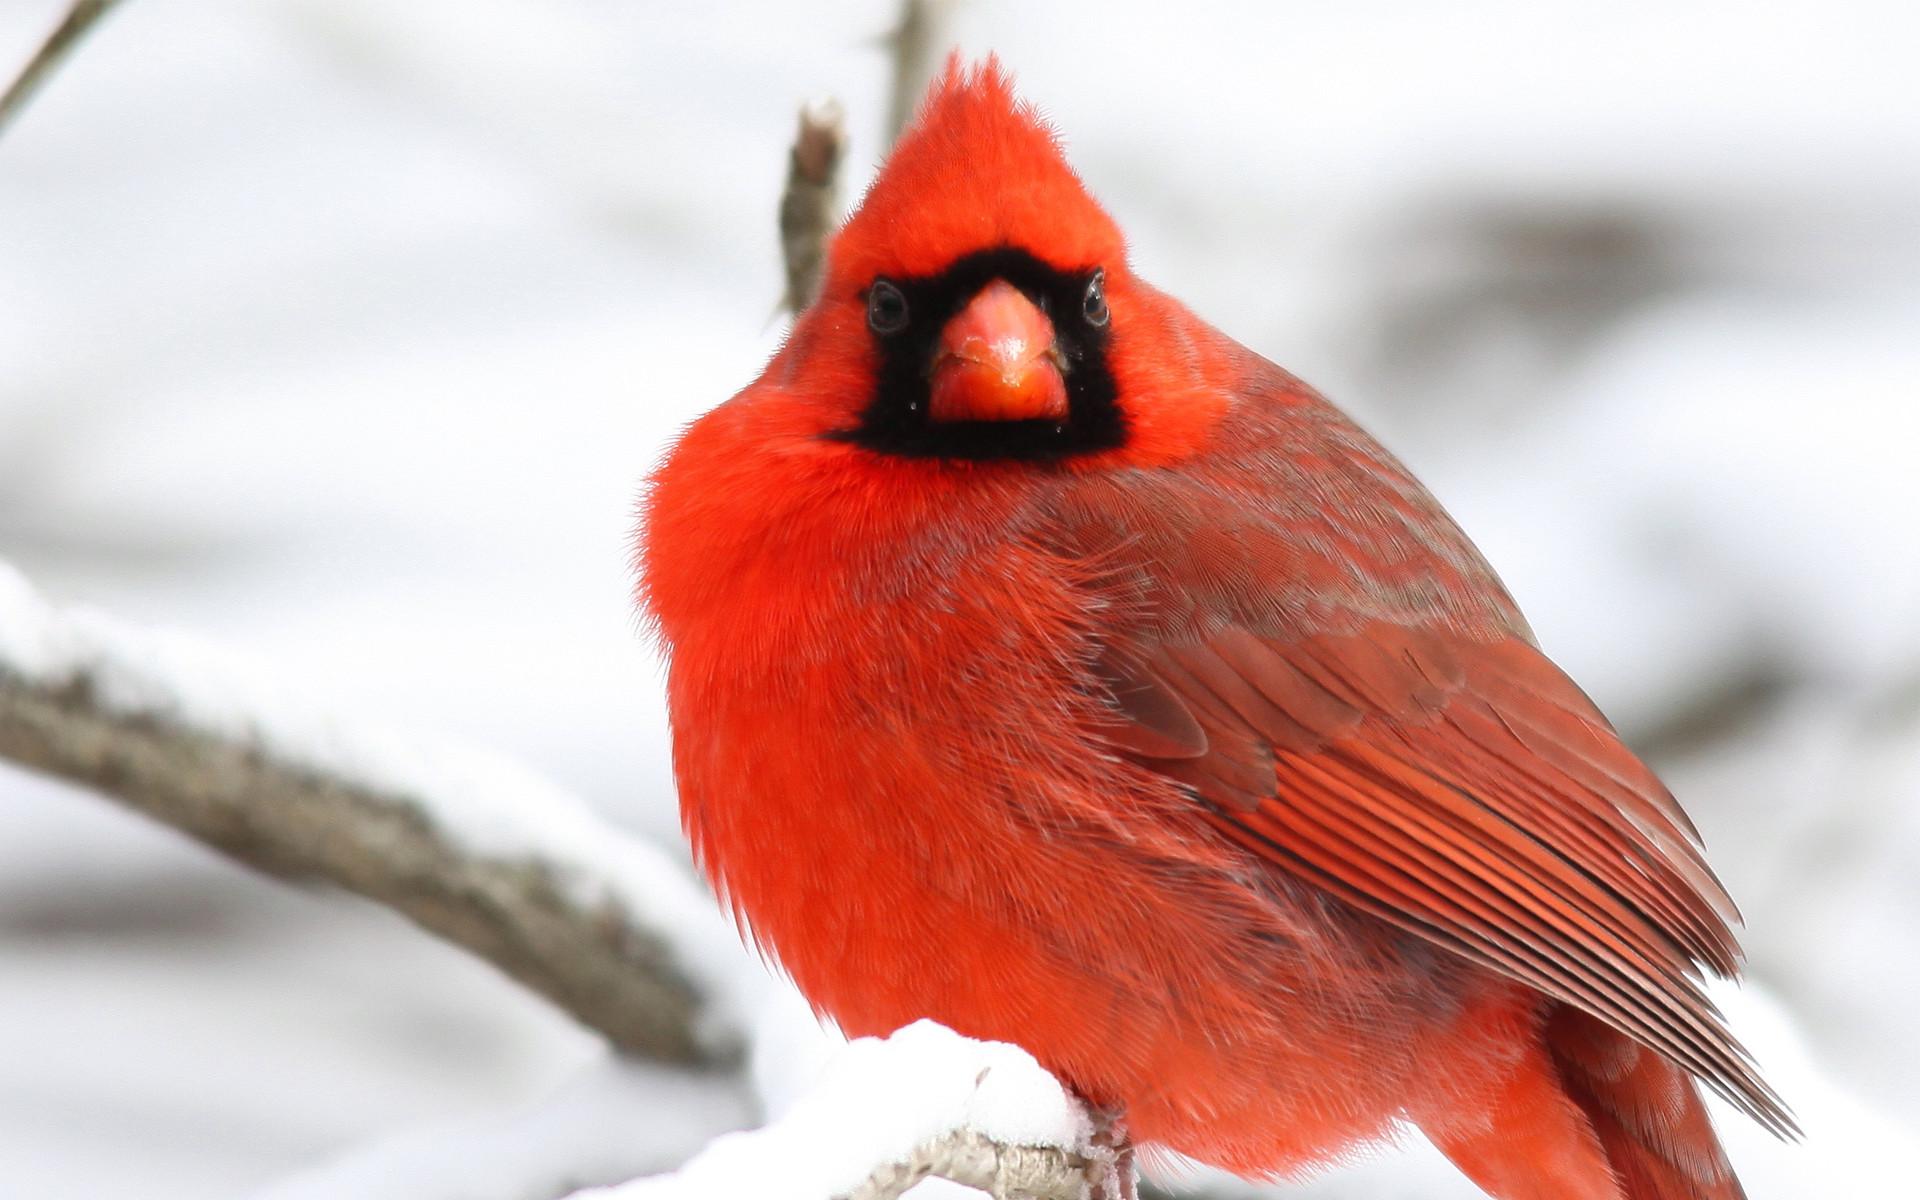 Northern Cardinal Bird Wallpaper – https://www.gbwallpapers.com/northern